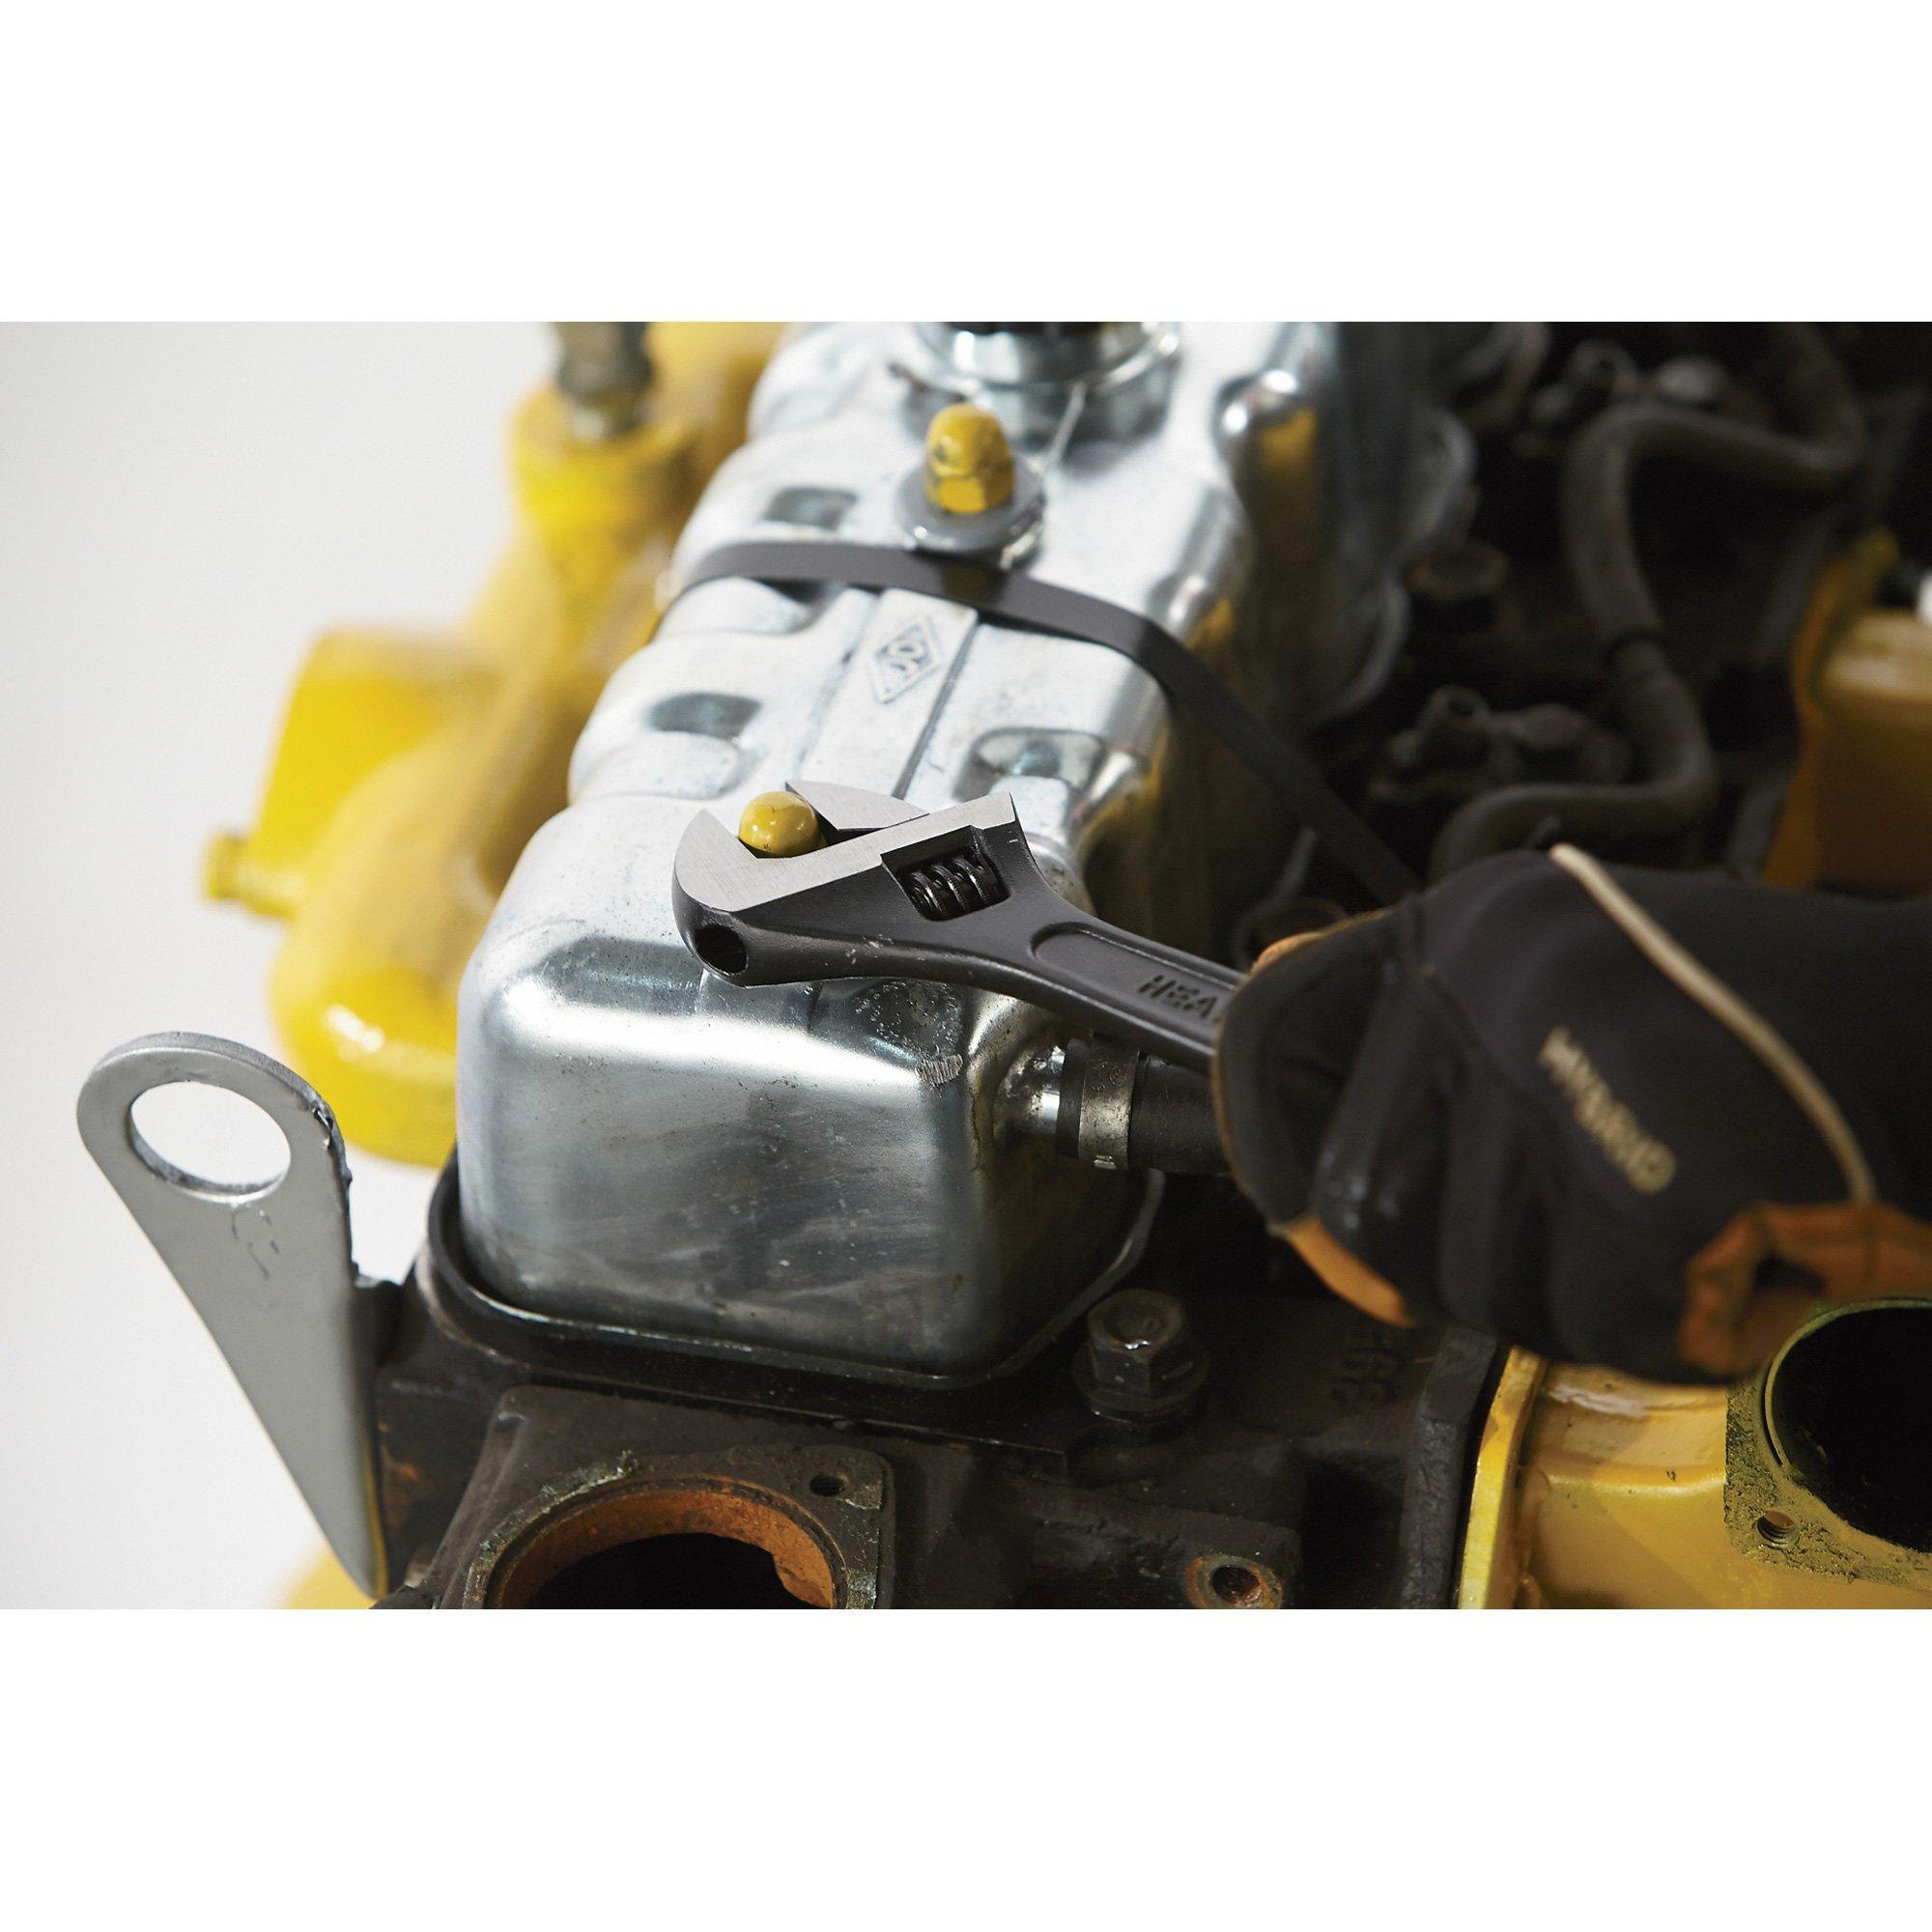 Klutch 4-Pc. Adjustable Wrench Set by Klutch